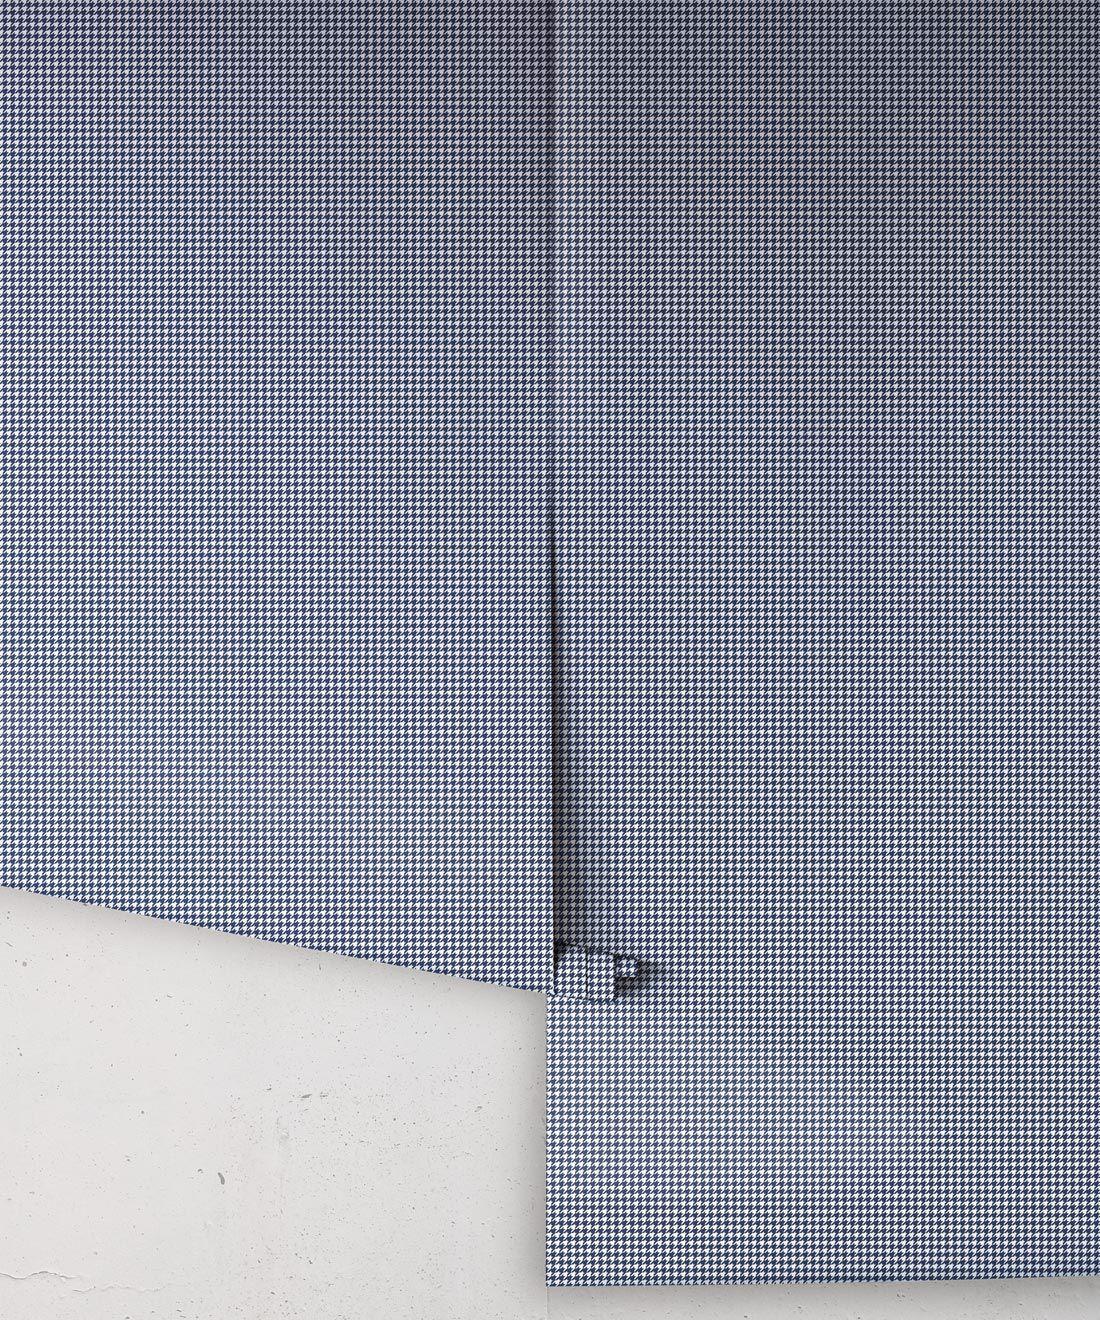 Houndstooth Wallpaper • Dogs tooth Wallpaper • Navy •Rolls